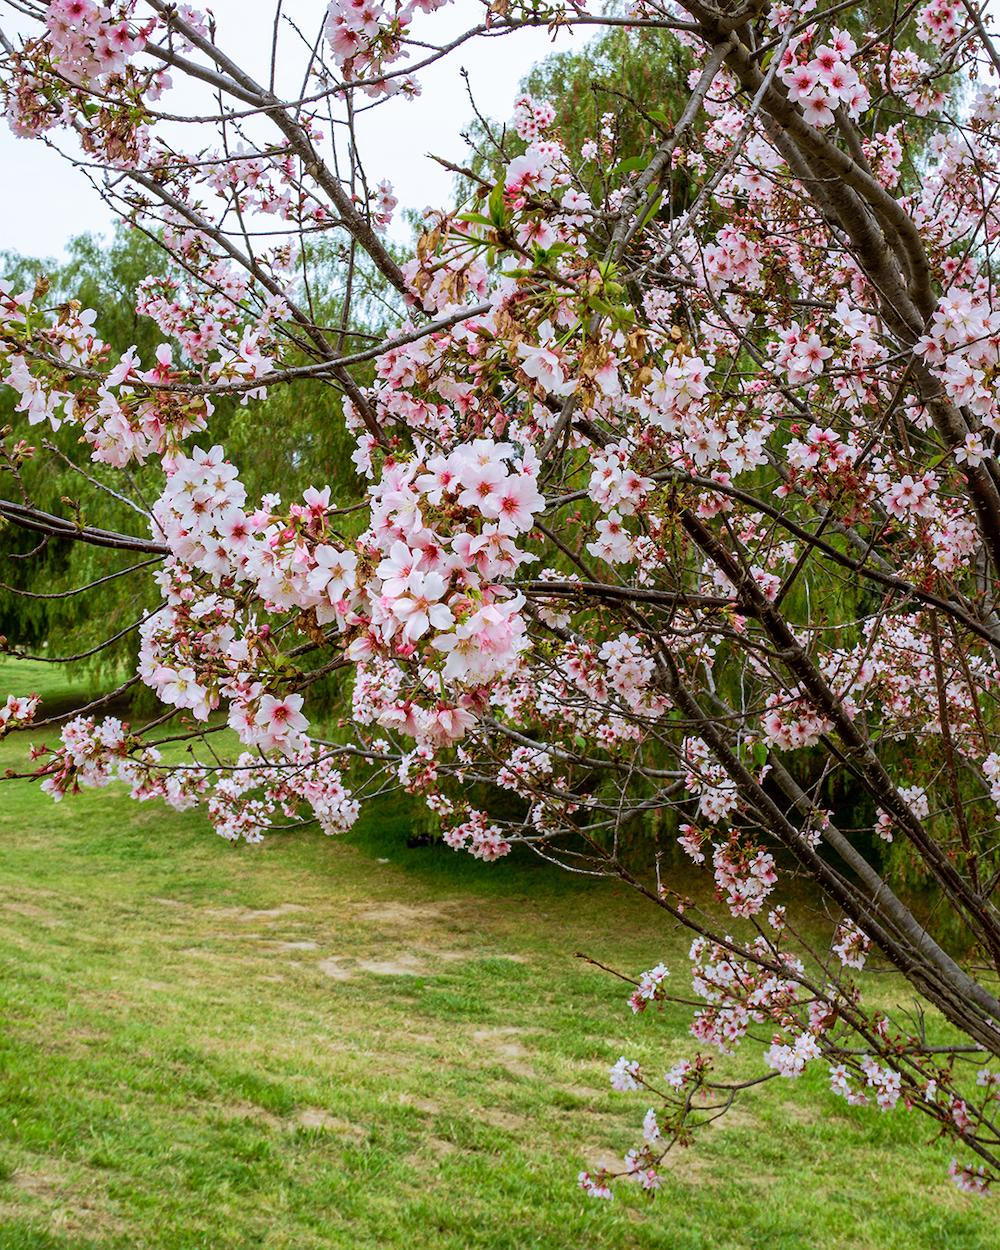 lake balboa park cherry blossoms los angeles